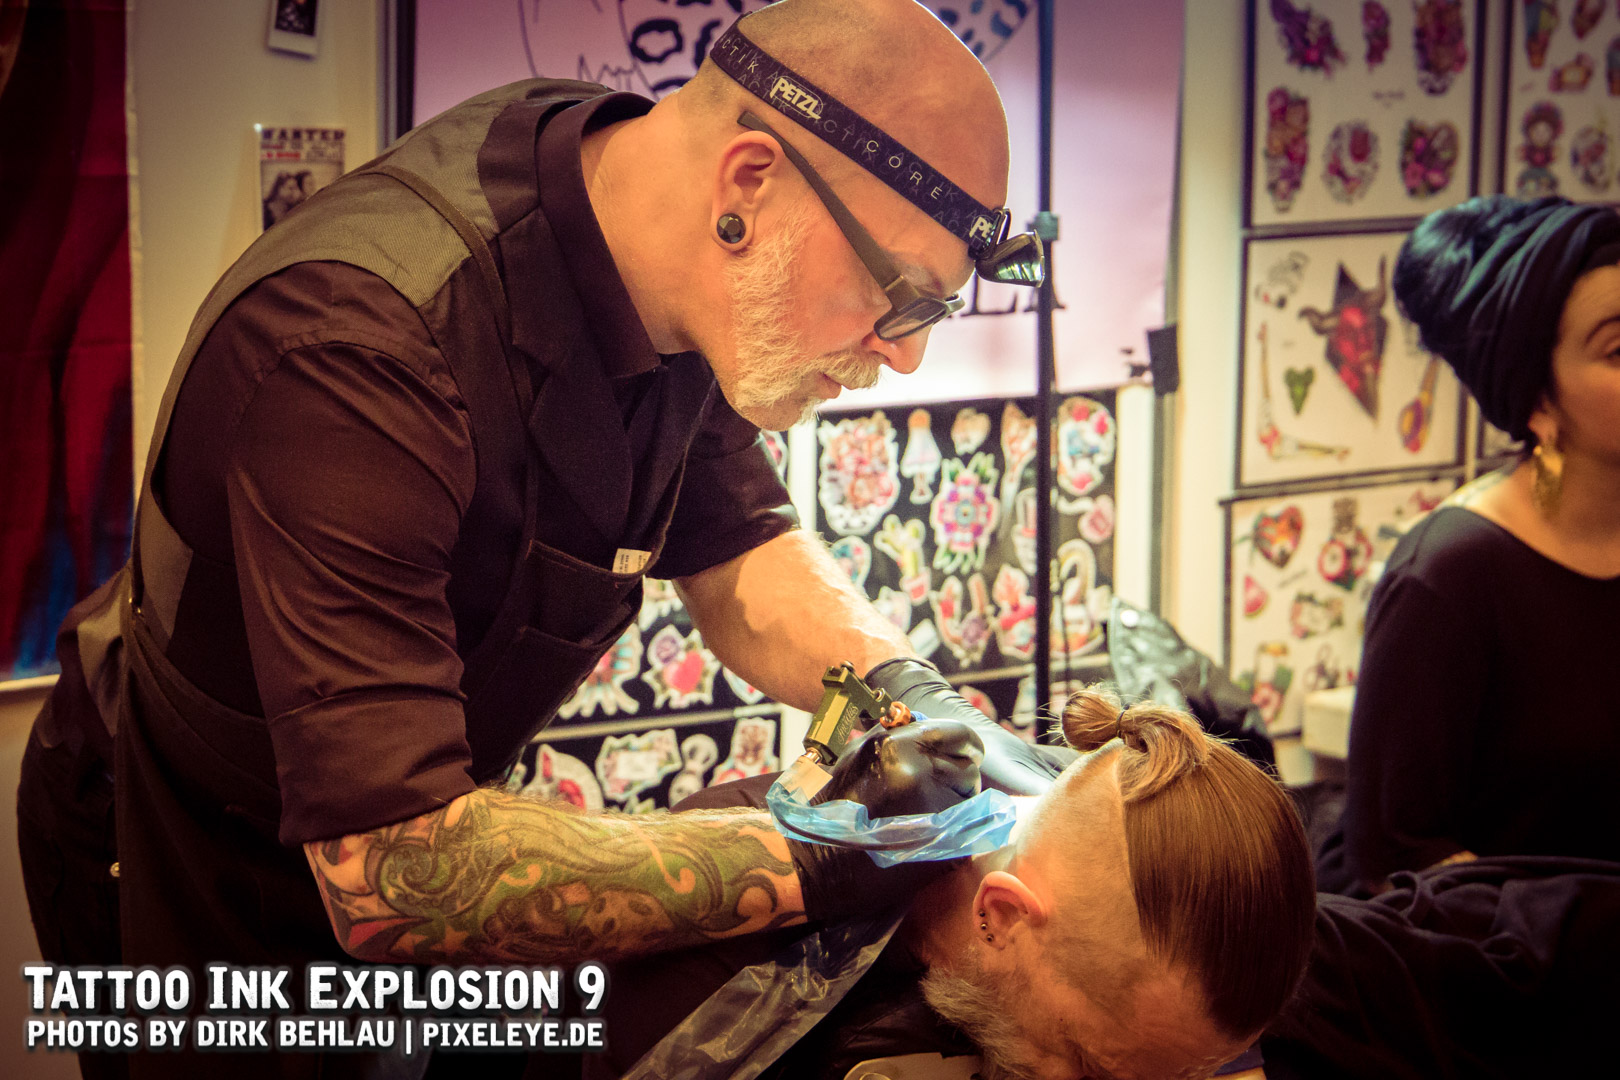 Tattoo Ink Explosion 2018 WEB by Dirk Behlau-0240.jpg